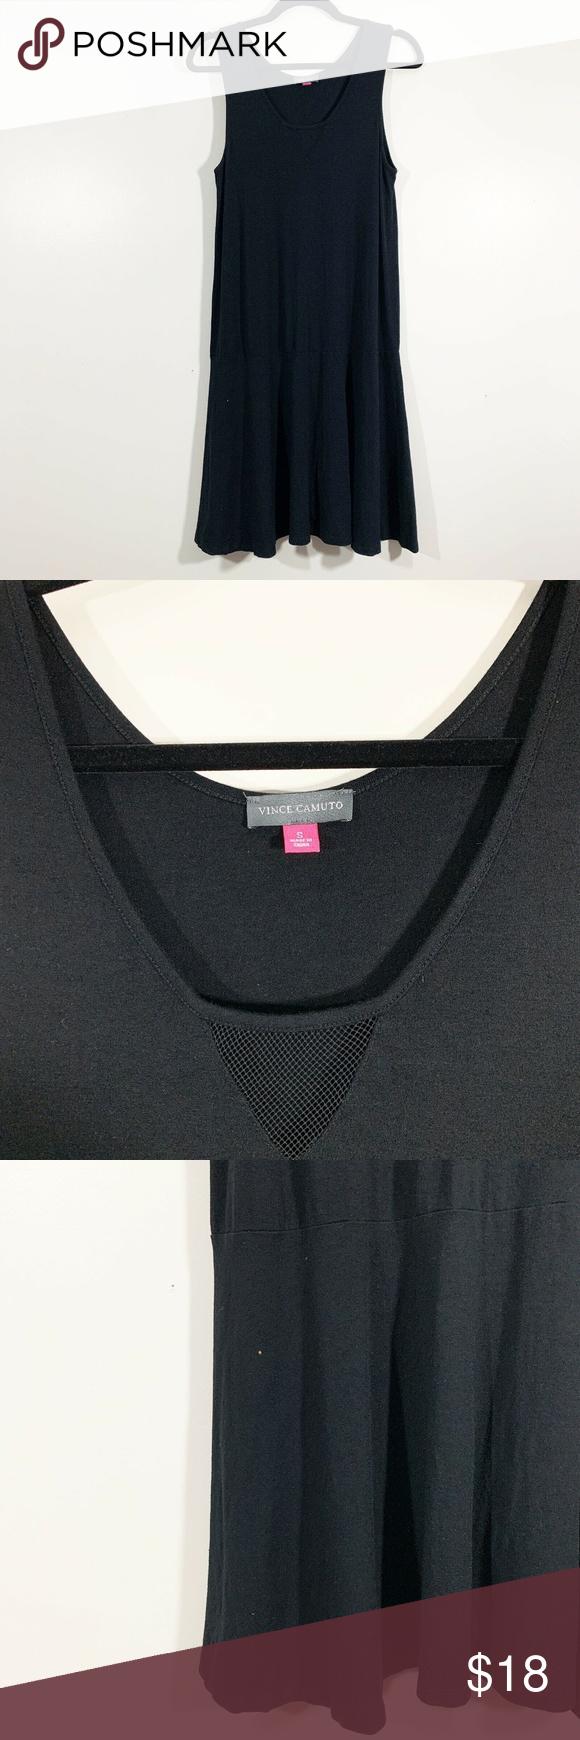 Vince Camuto Black Sleeveless Knit Shift Dress S Knit Shift Dress Shift Dress Black Sleeveless [ 1740 x 580 Pixel ]